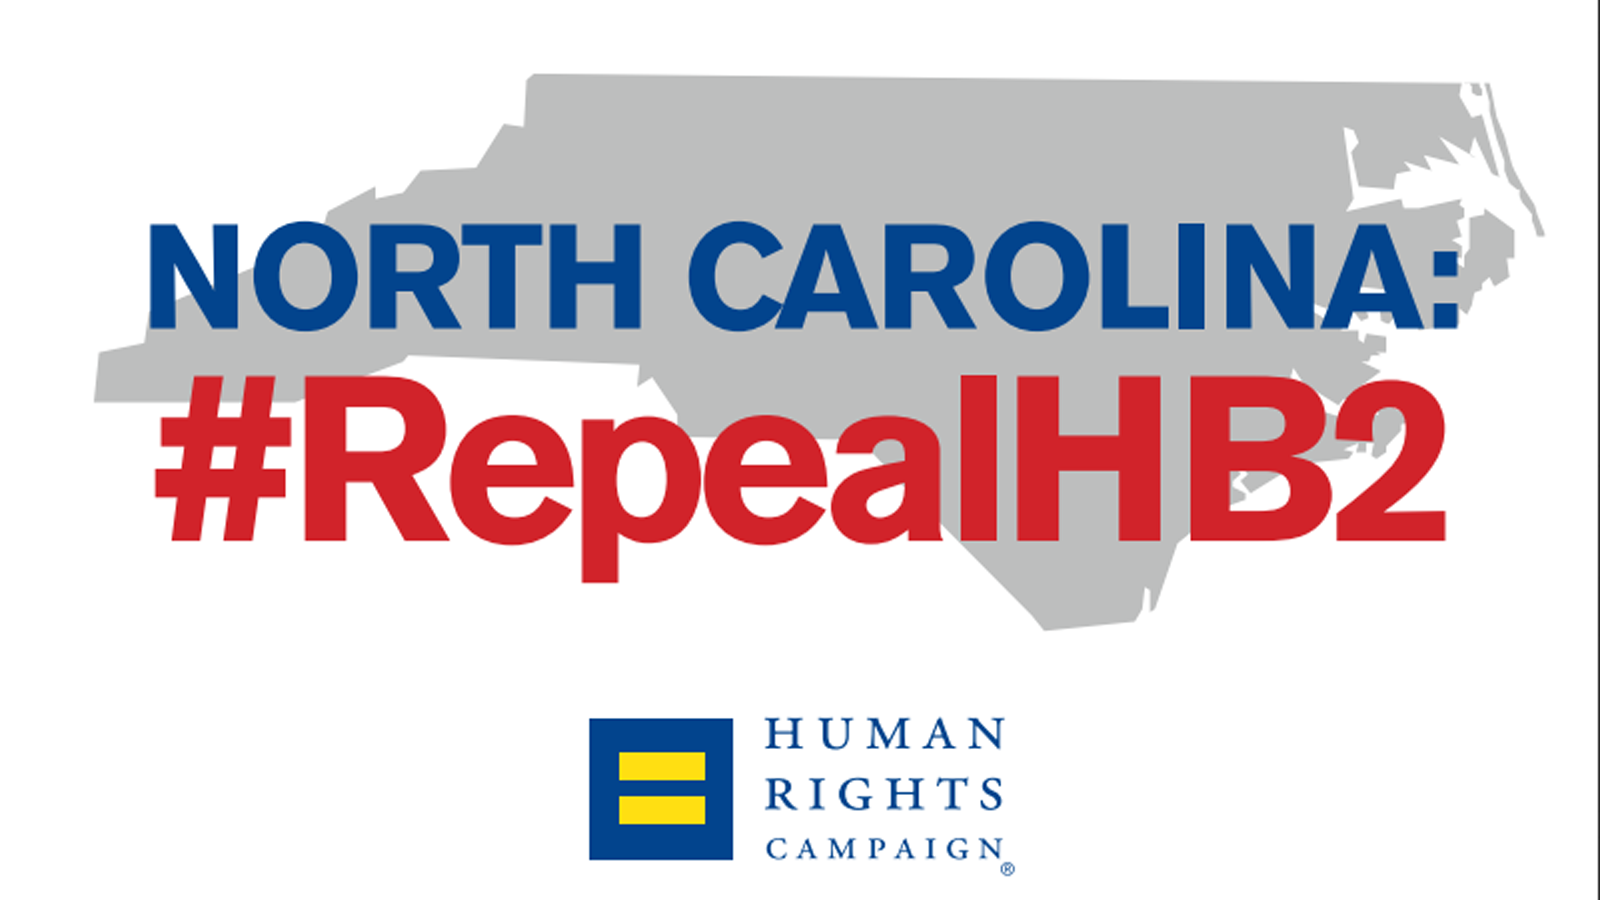 DOJ Files Complaint Against North Carolina to Stop Discrimination Against Transgender Individuals